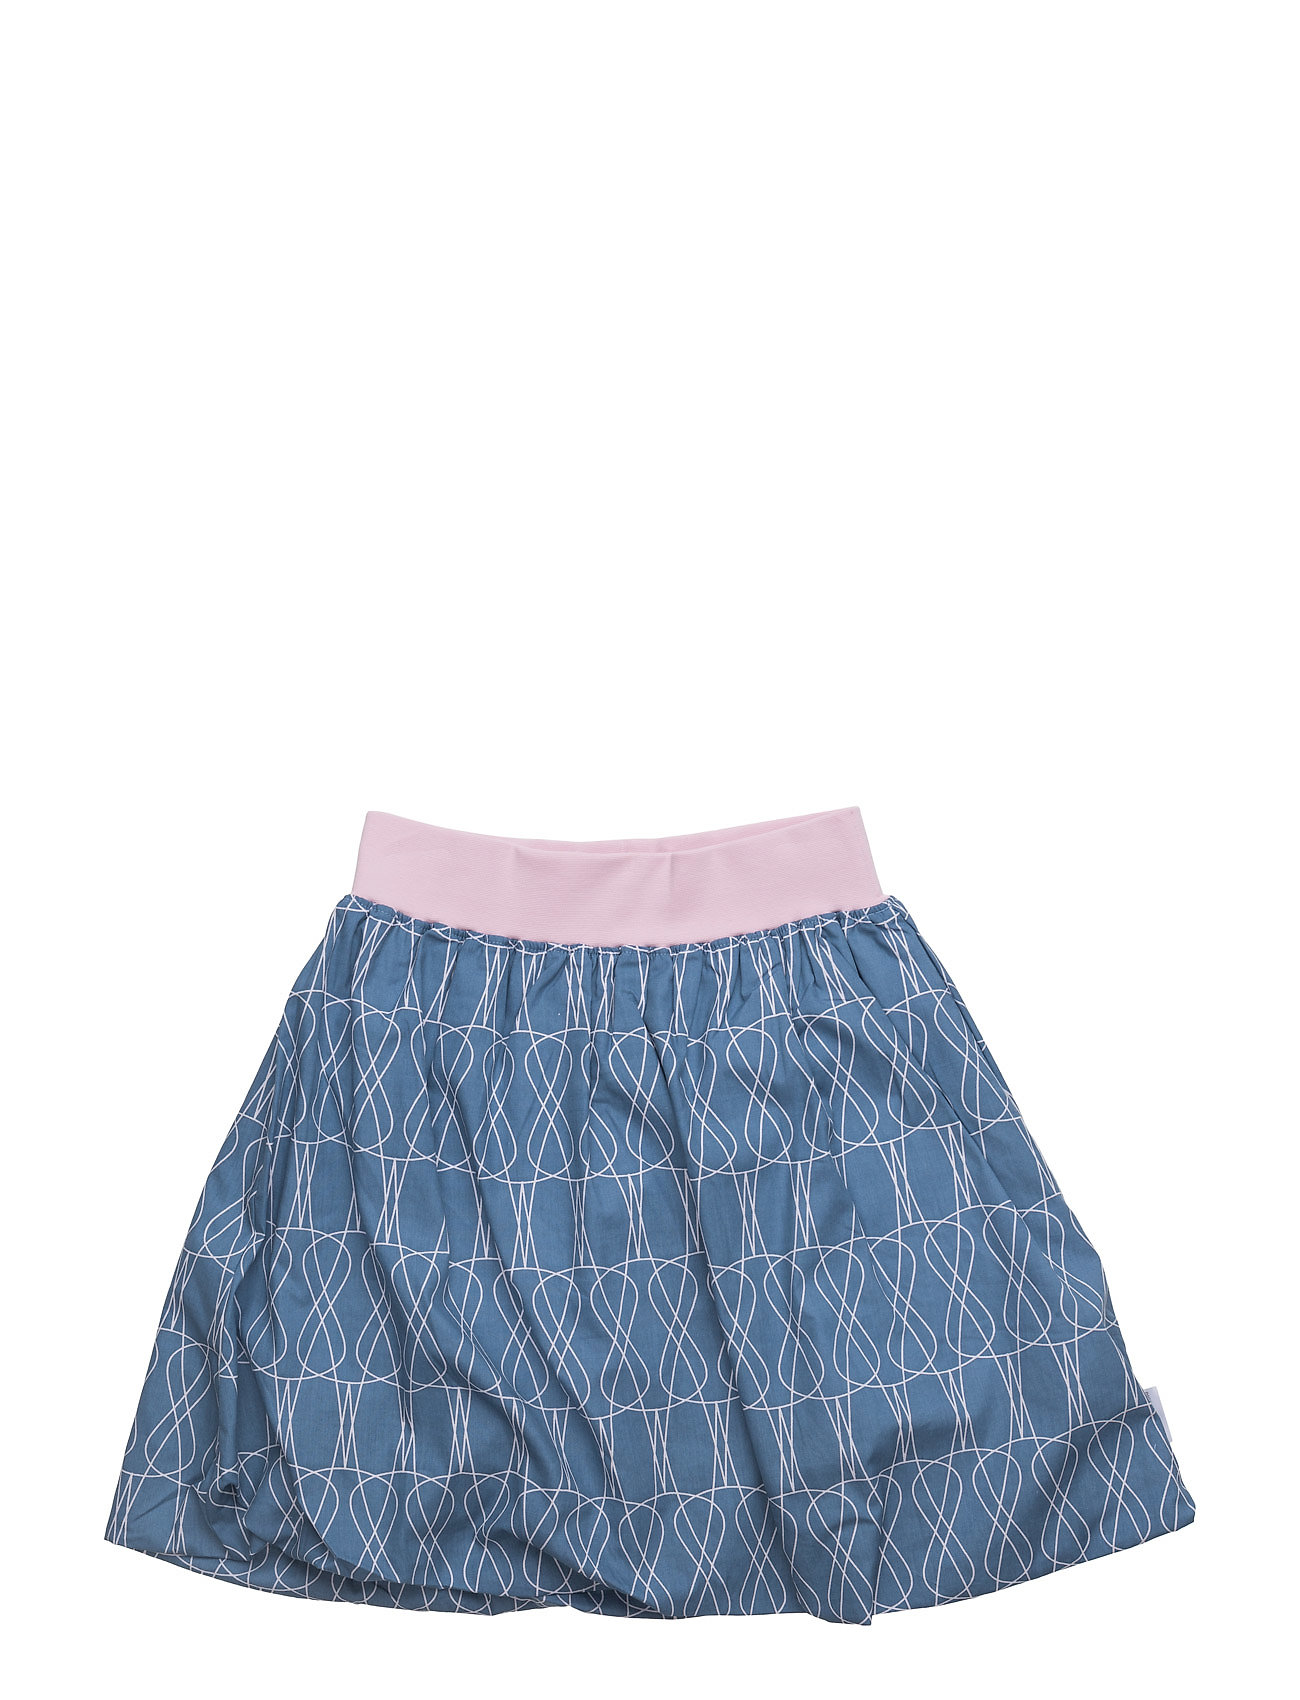 Palma Pop Skirt